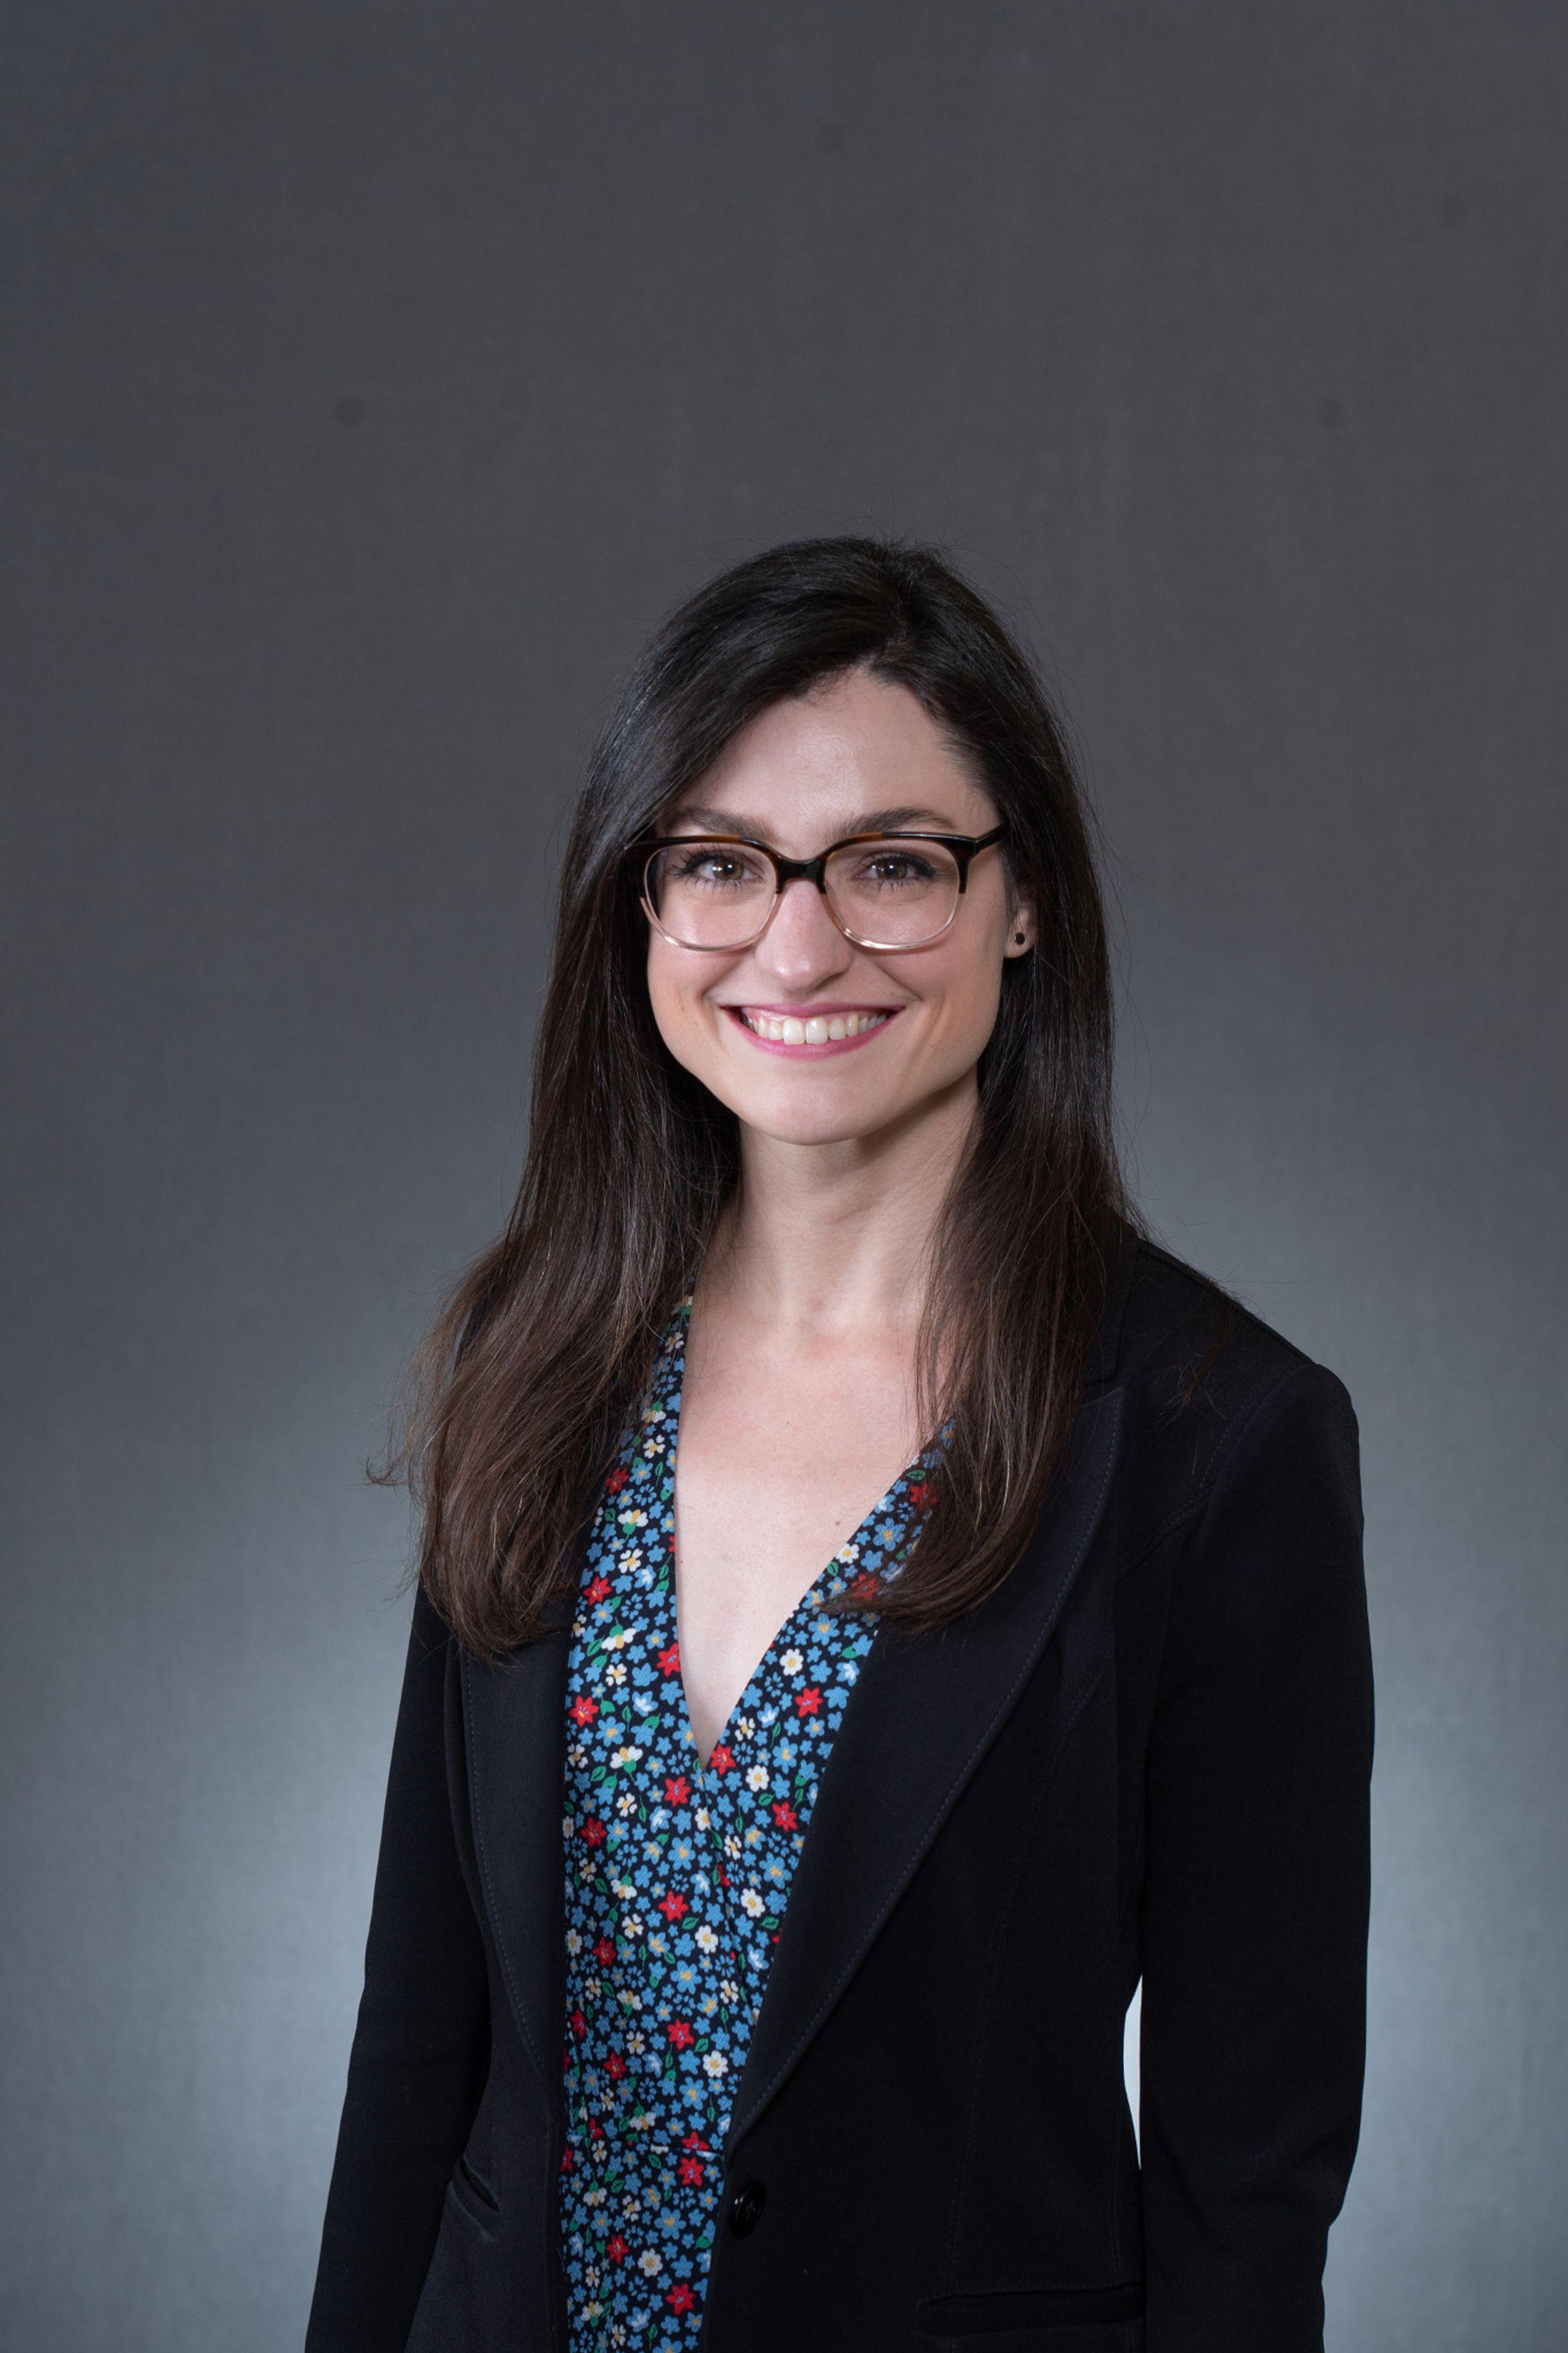 Jessica Comola